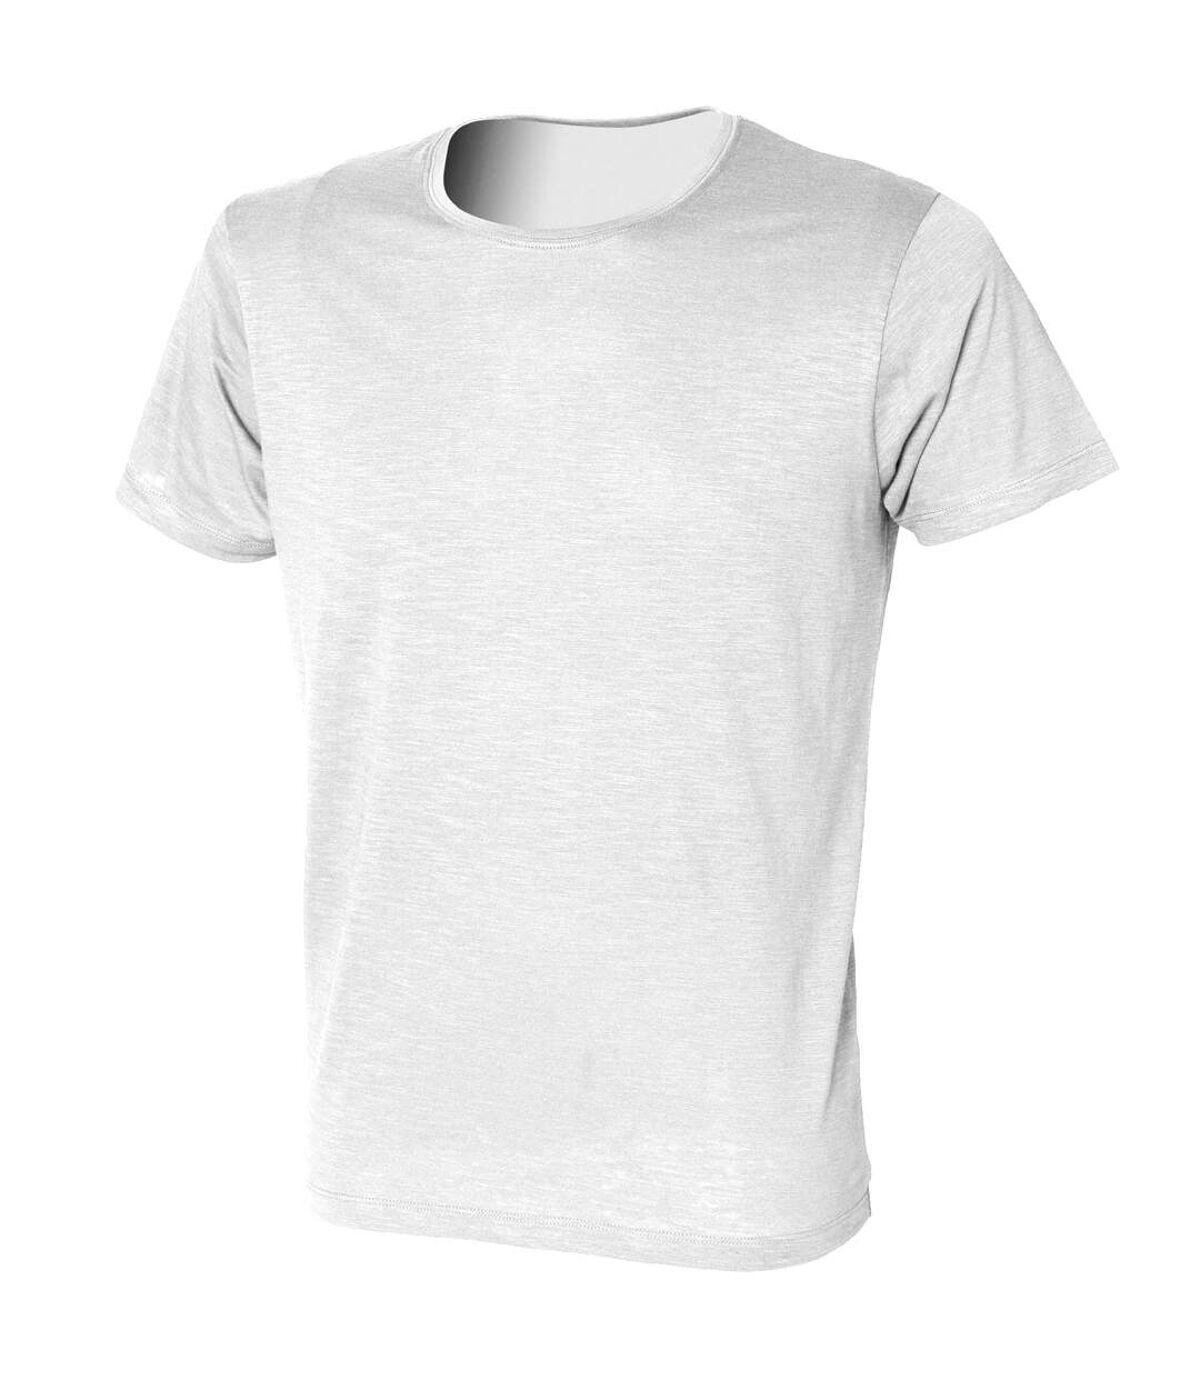 Skinni Fit Mens Slub T-Shirt (White) - UTRW1391